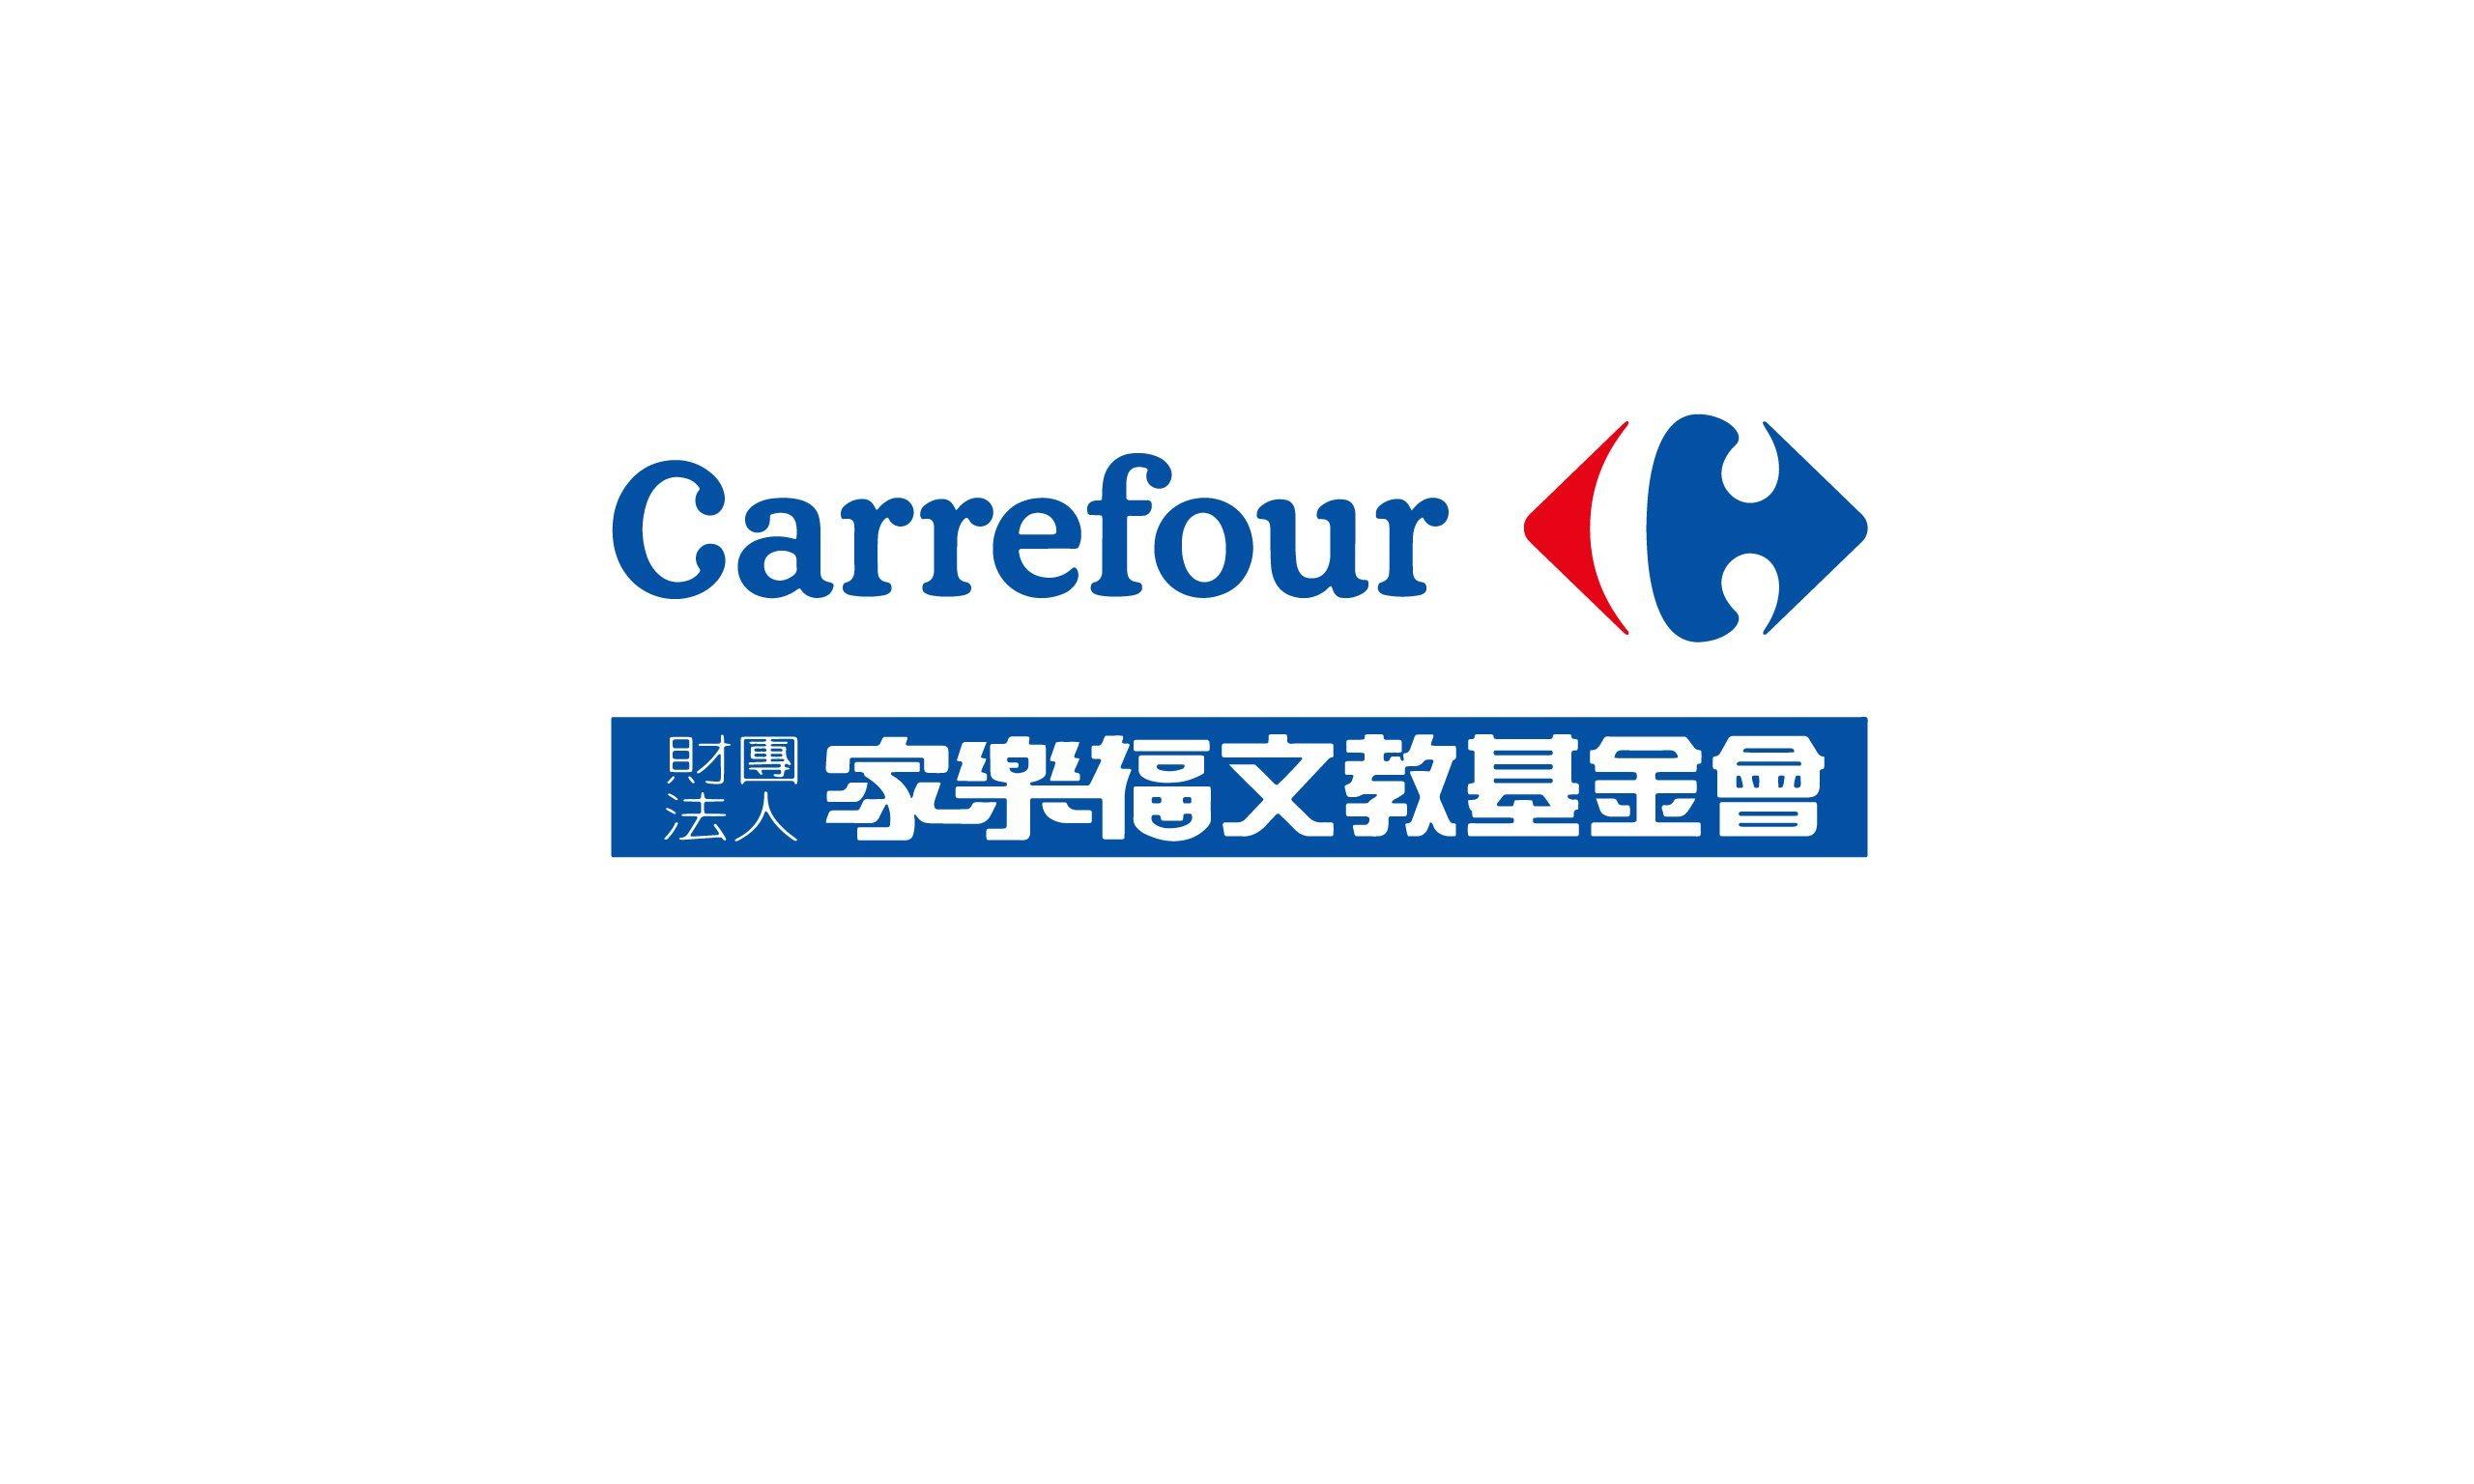 Carrefour Foundation